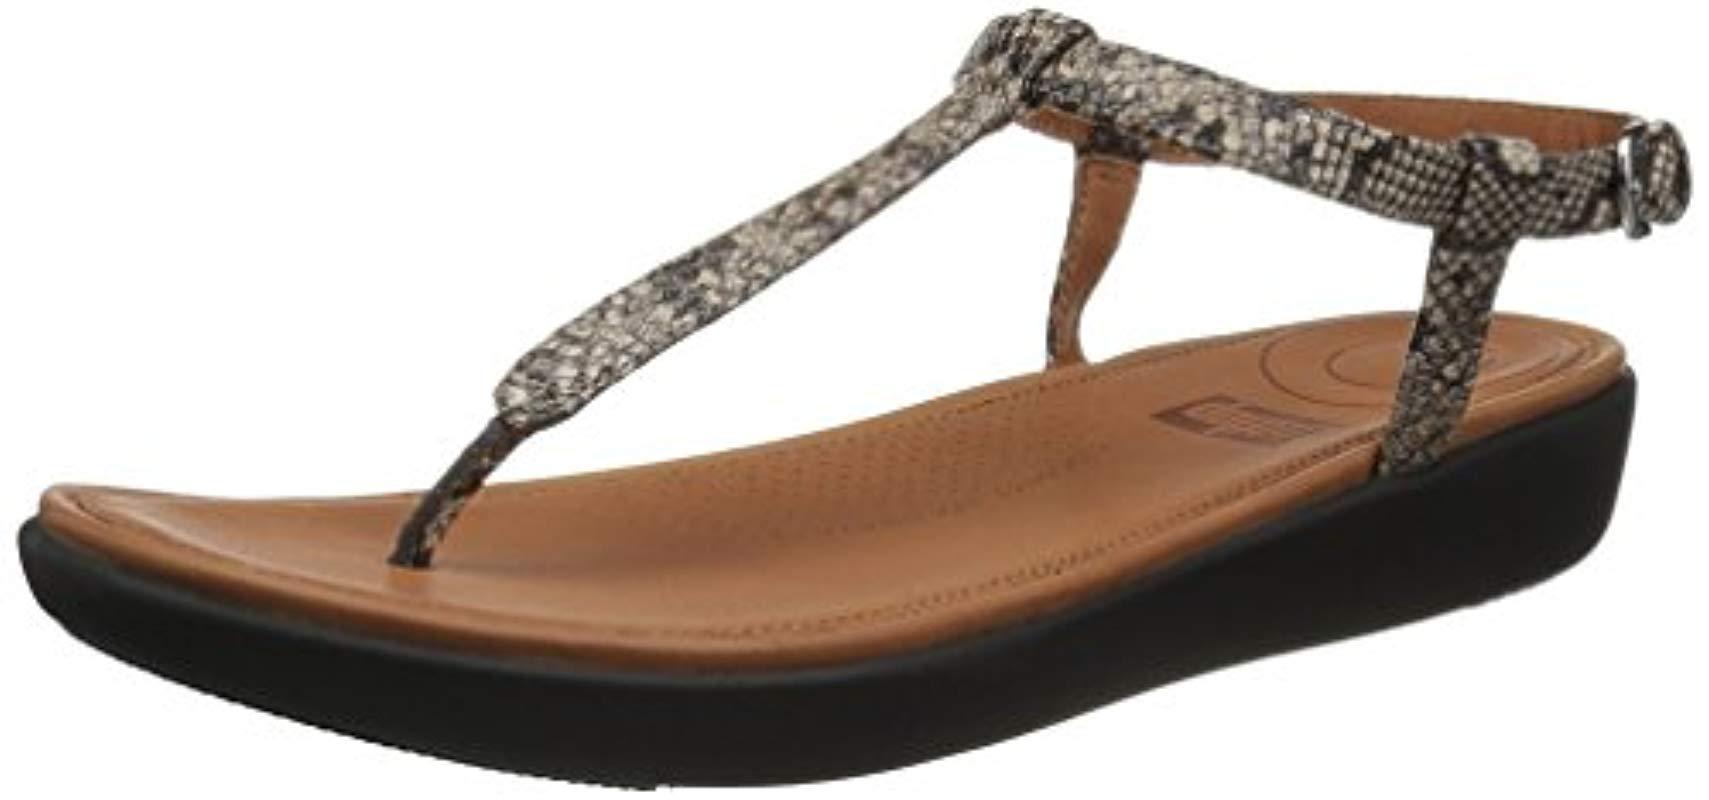 948f5c98e54d Lyst - Fitflop Tia Toe-thong Sandals Flat - Save 4%